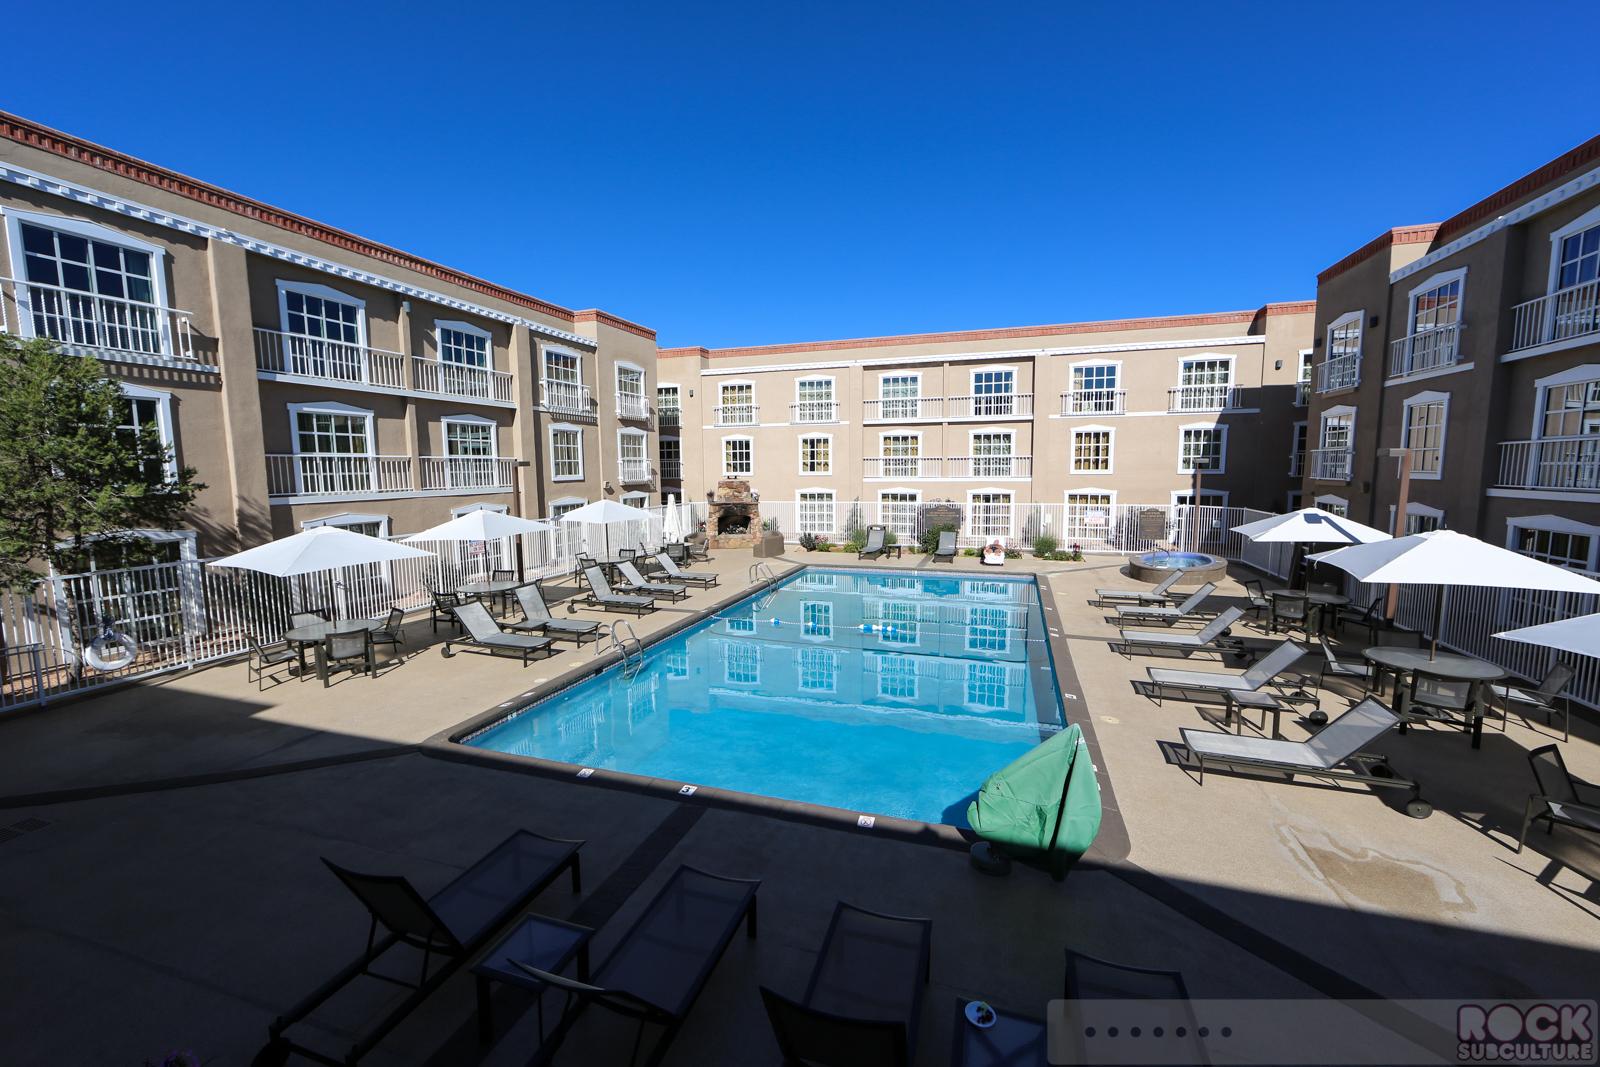 Hilton Hotel Santa Fe Historic Plaza